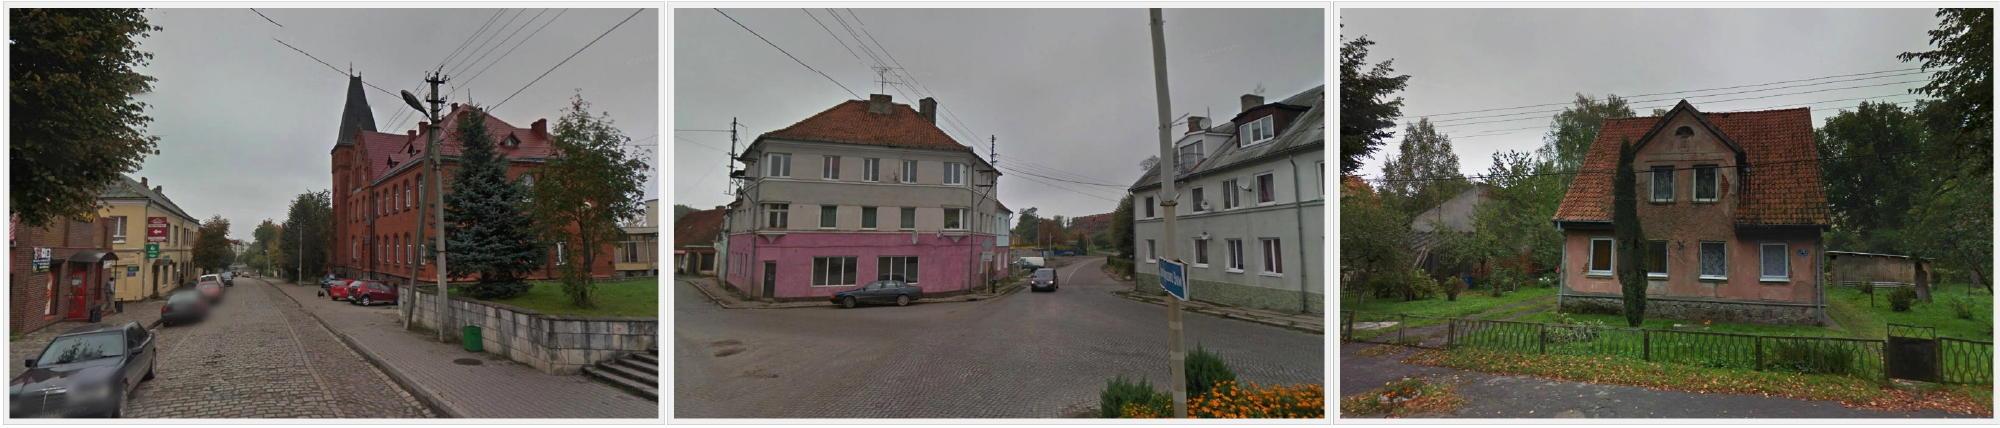 GoogleMaps_PrEylau-horz